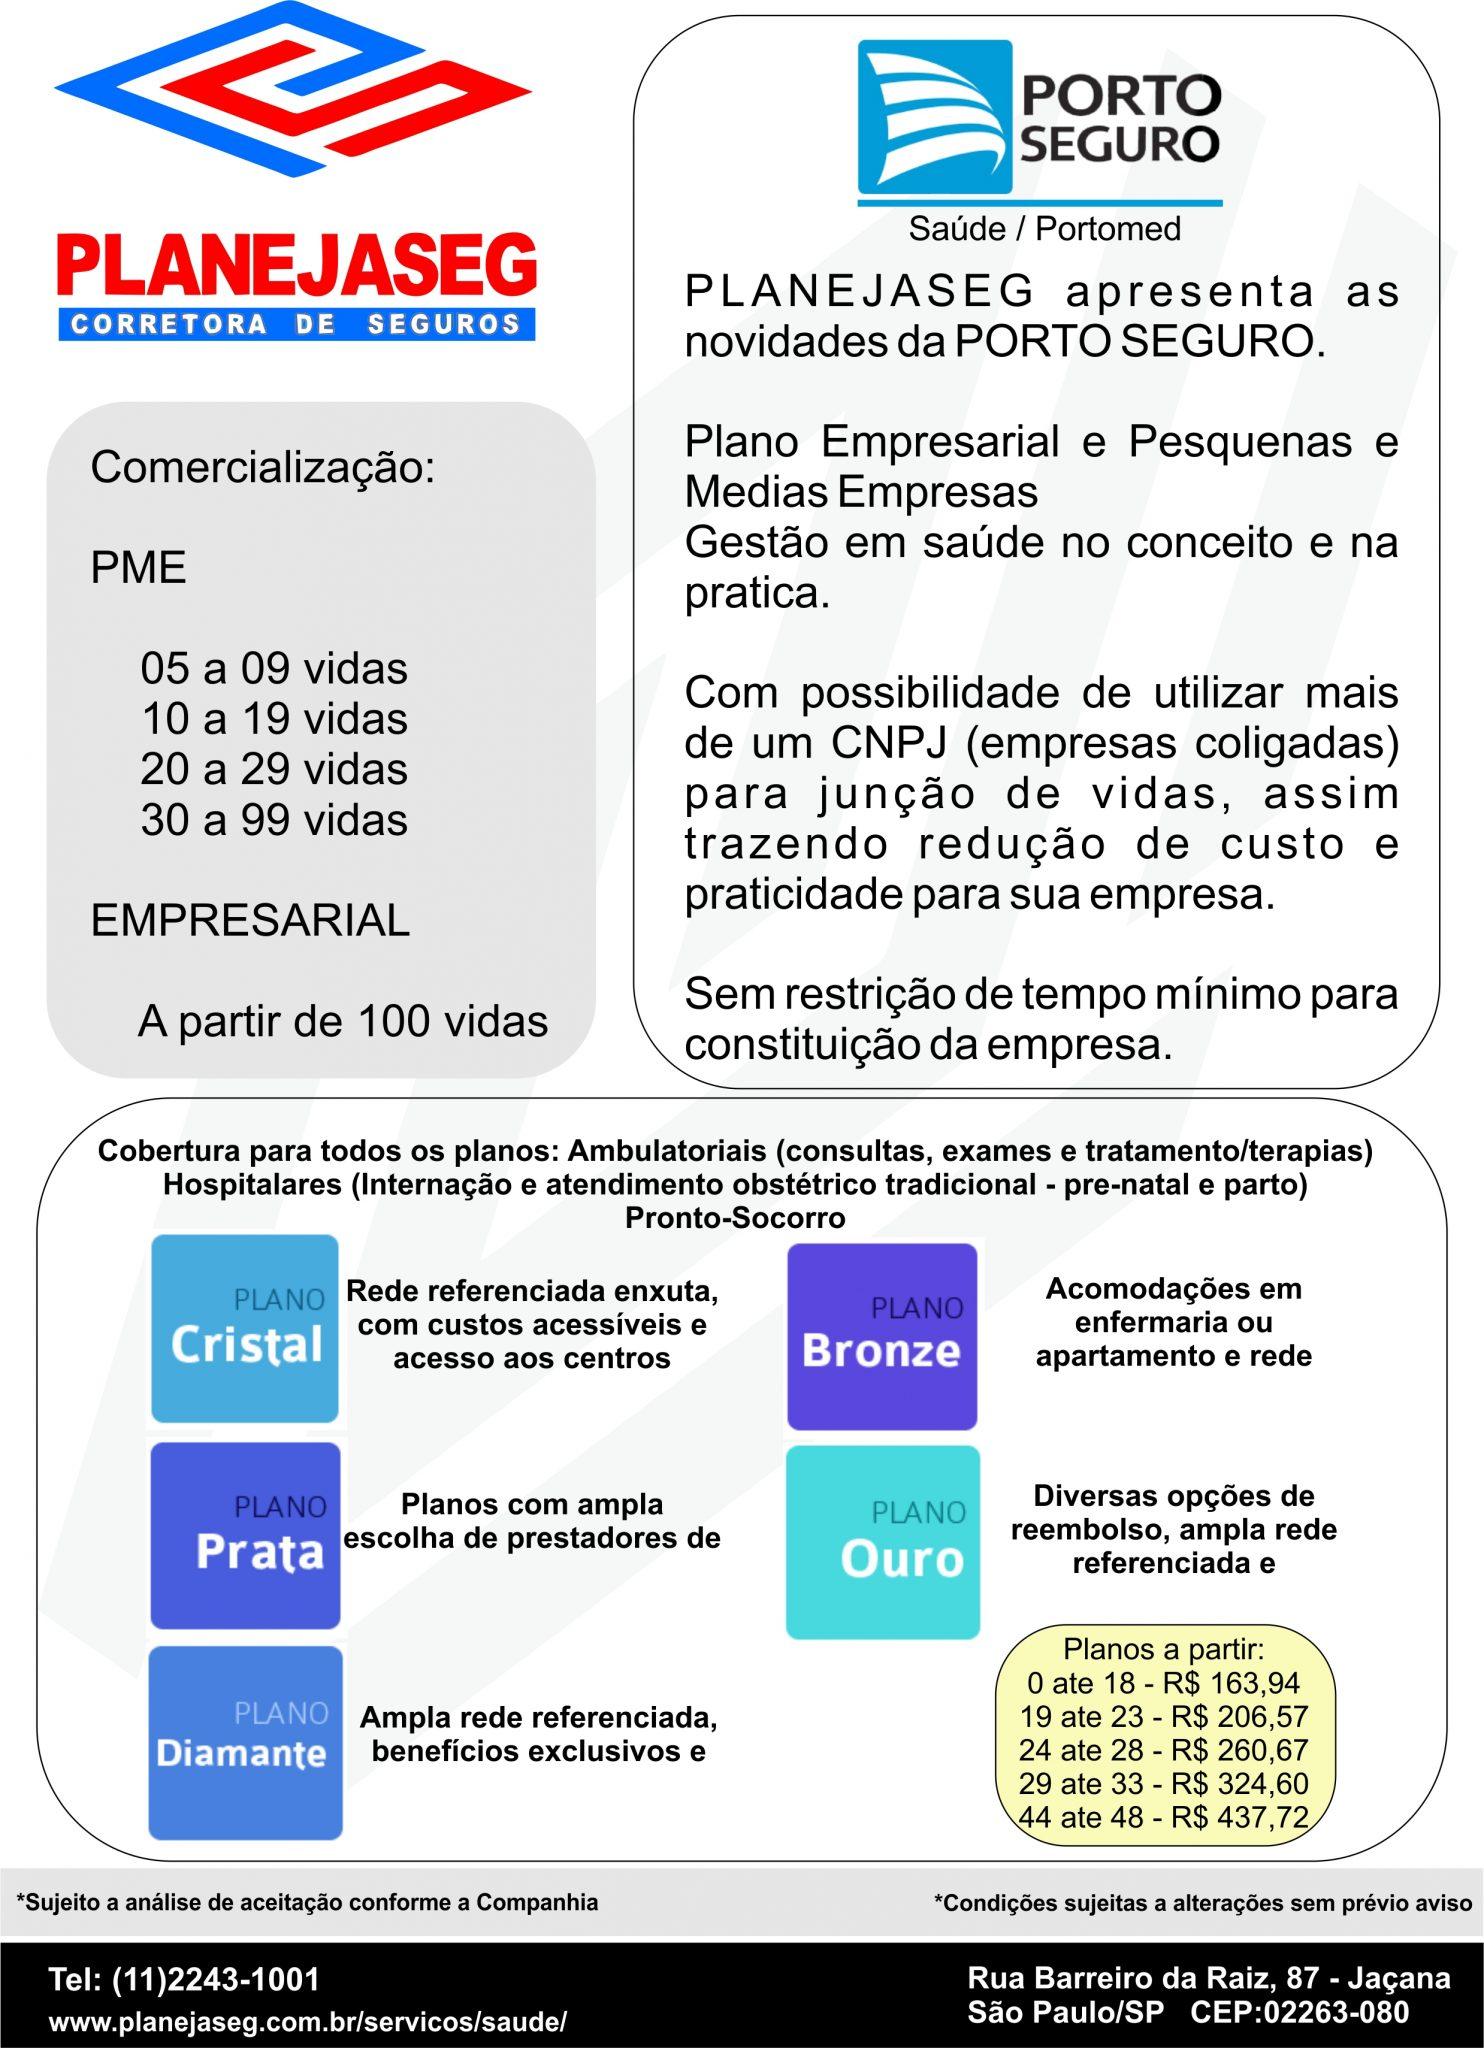 Saude PME e Empresarial - Porto Seguro